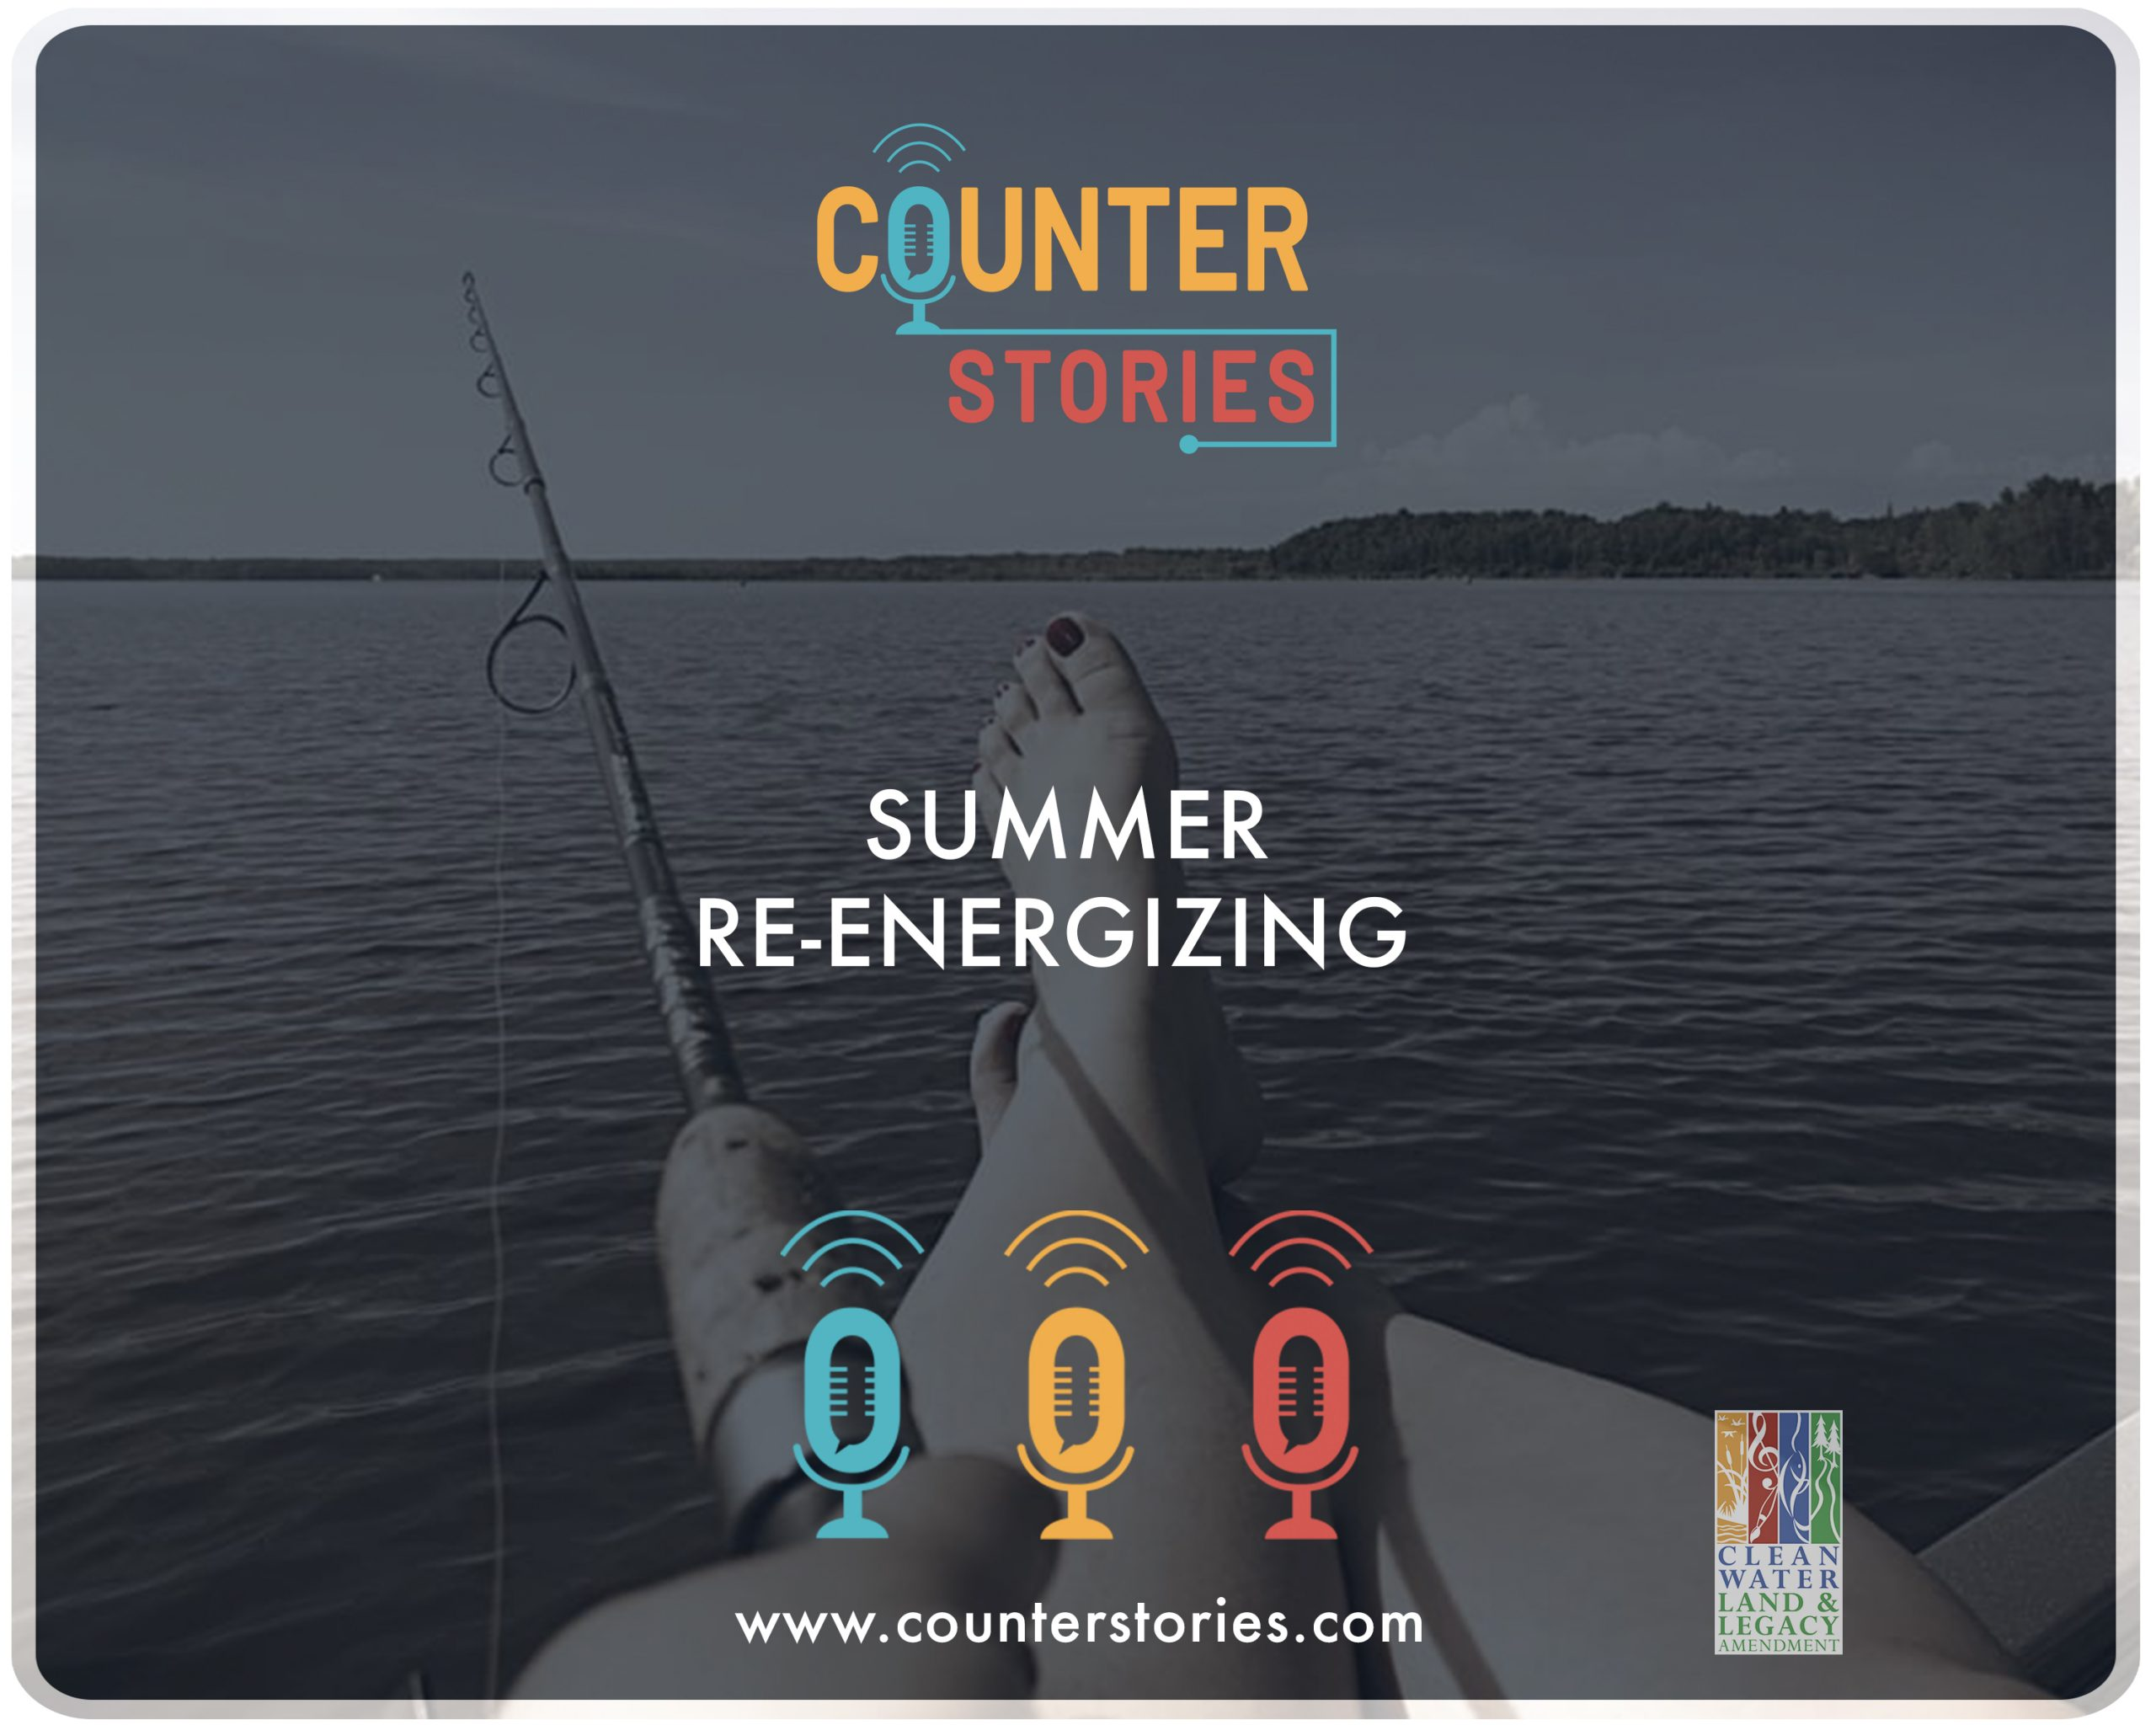 Summer Re-Energizing